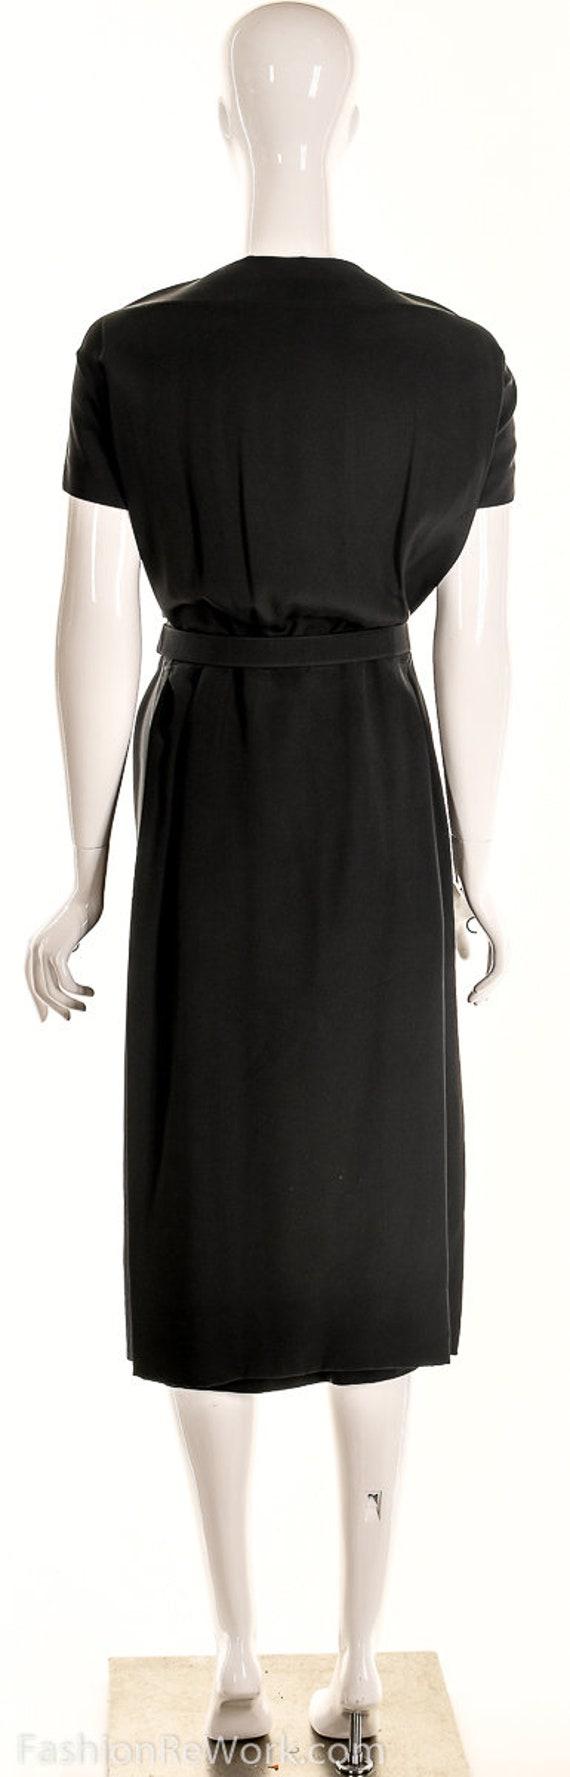 Vintage 40s Black Pencil Dress,40s Va Va Voom Dre… - image 7